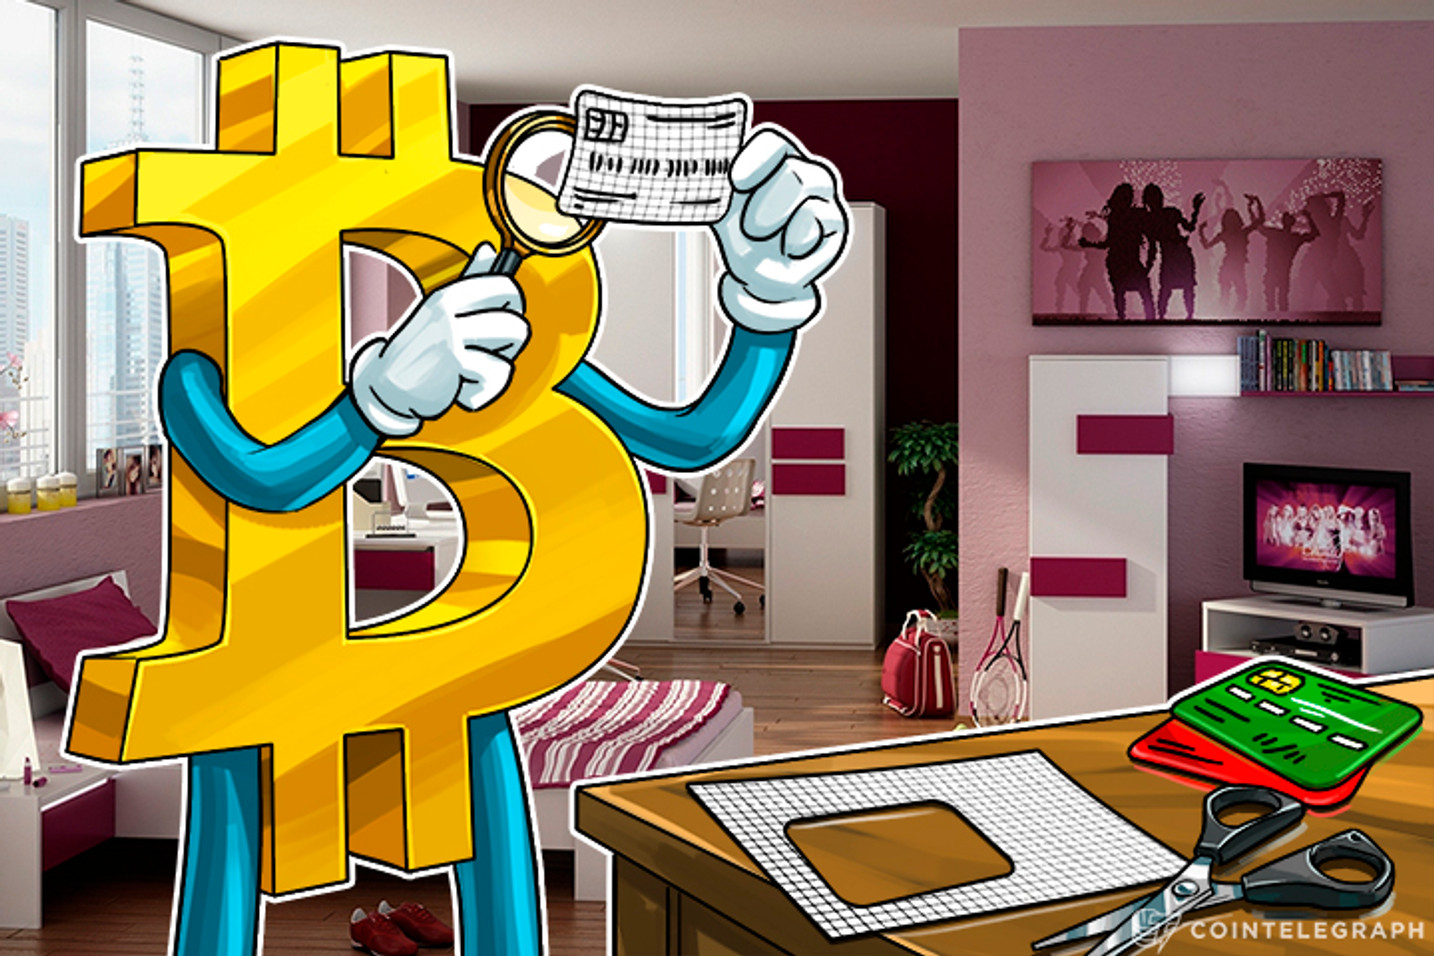 Hackers Eye E-Commerce Platforms, Bitcoin-Based OpenBazaar to Capitalize